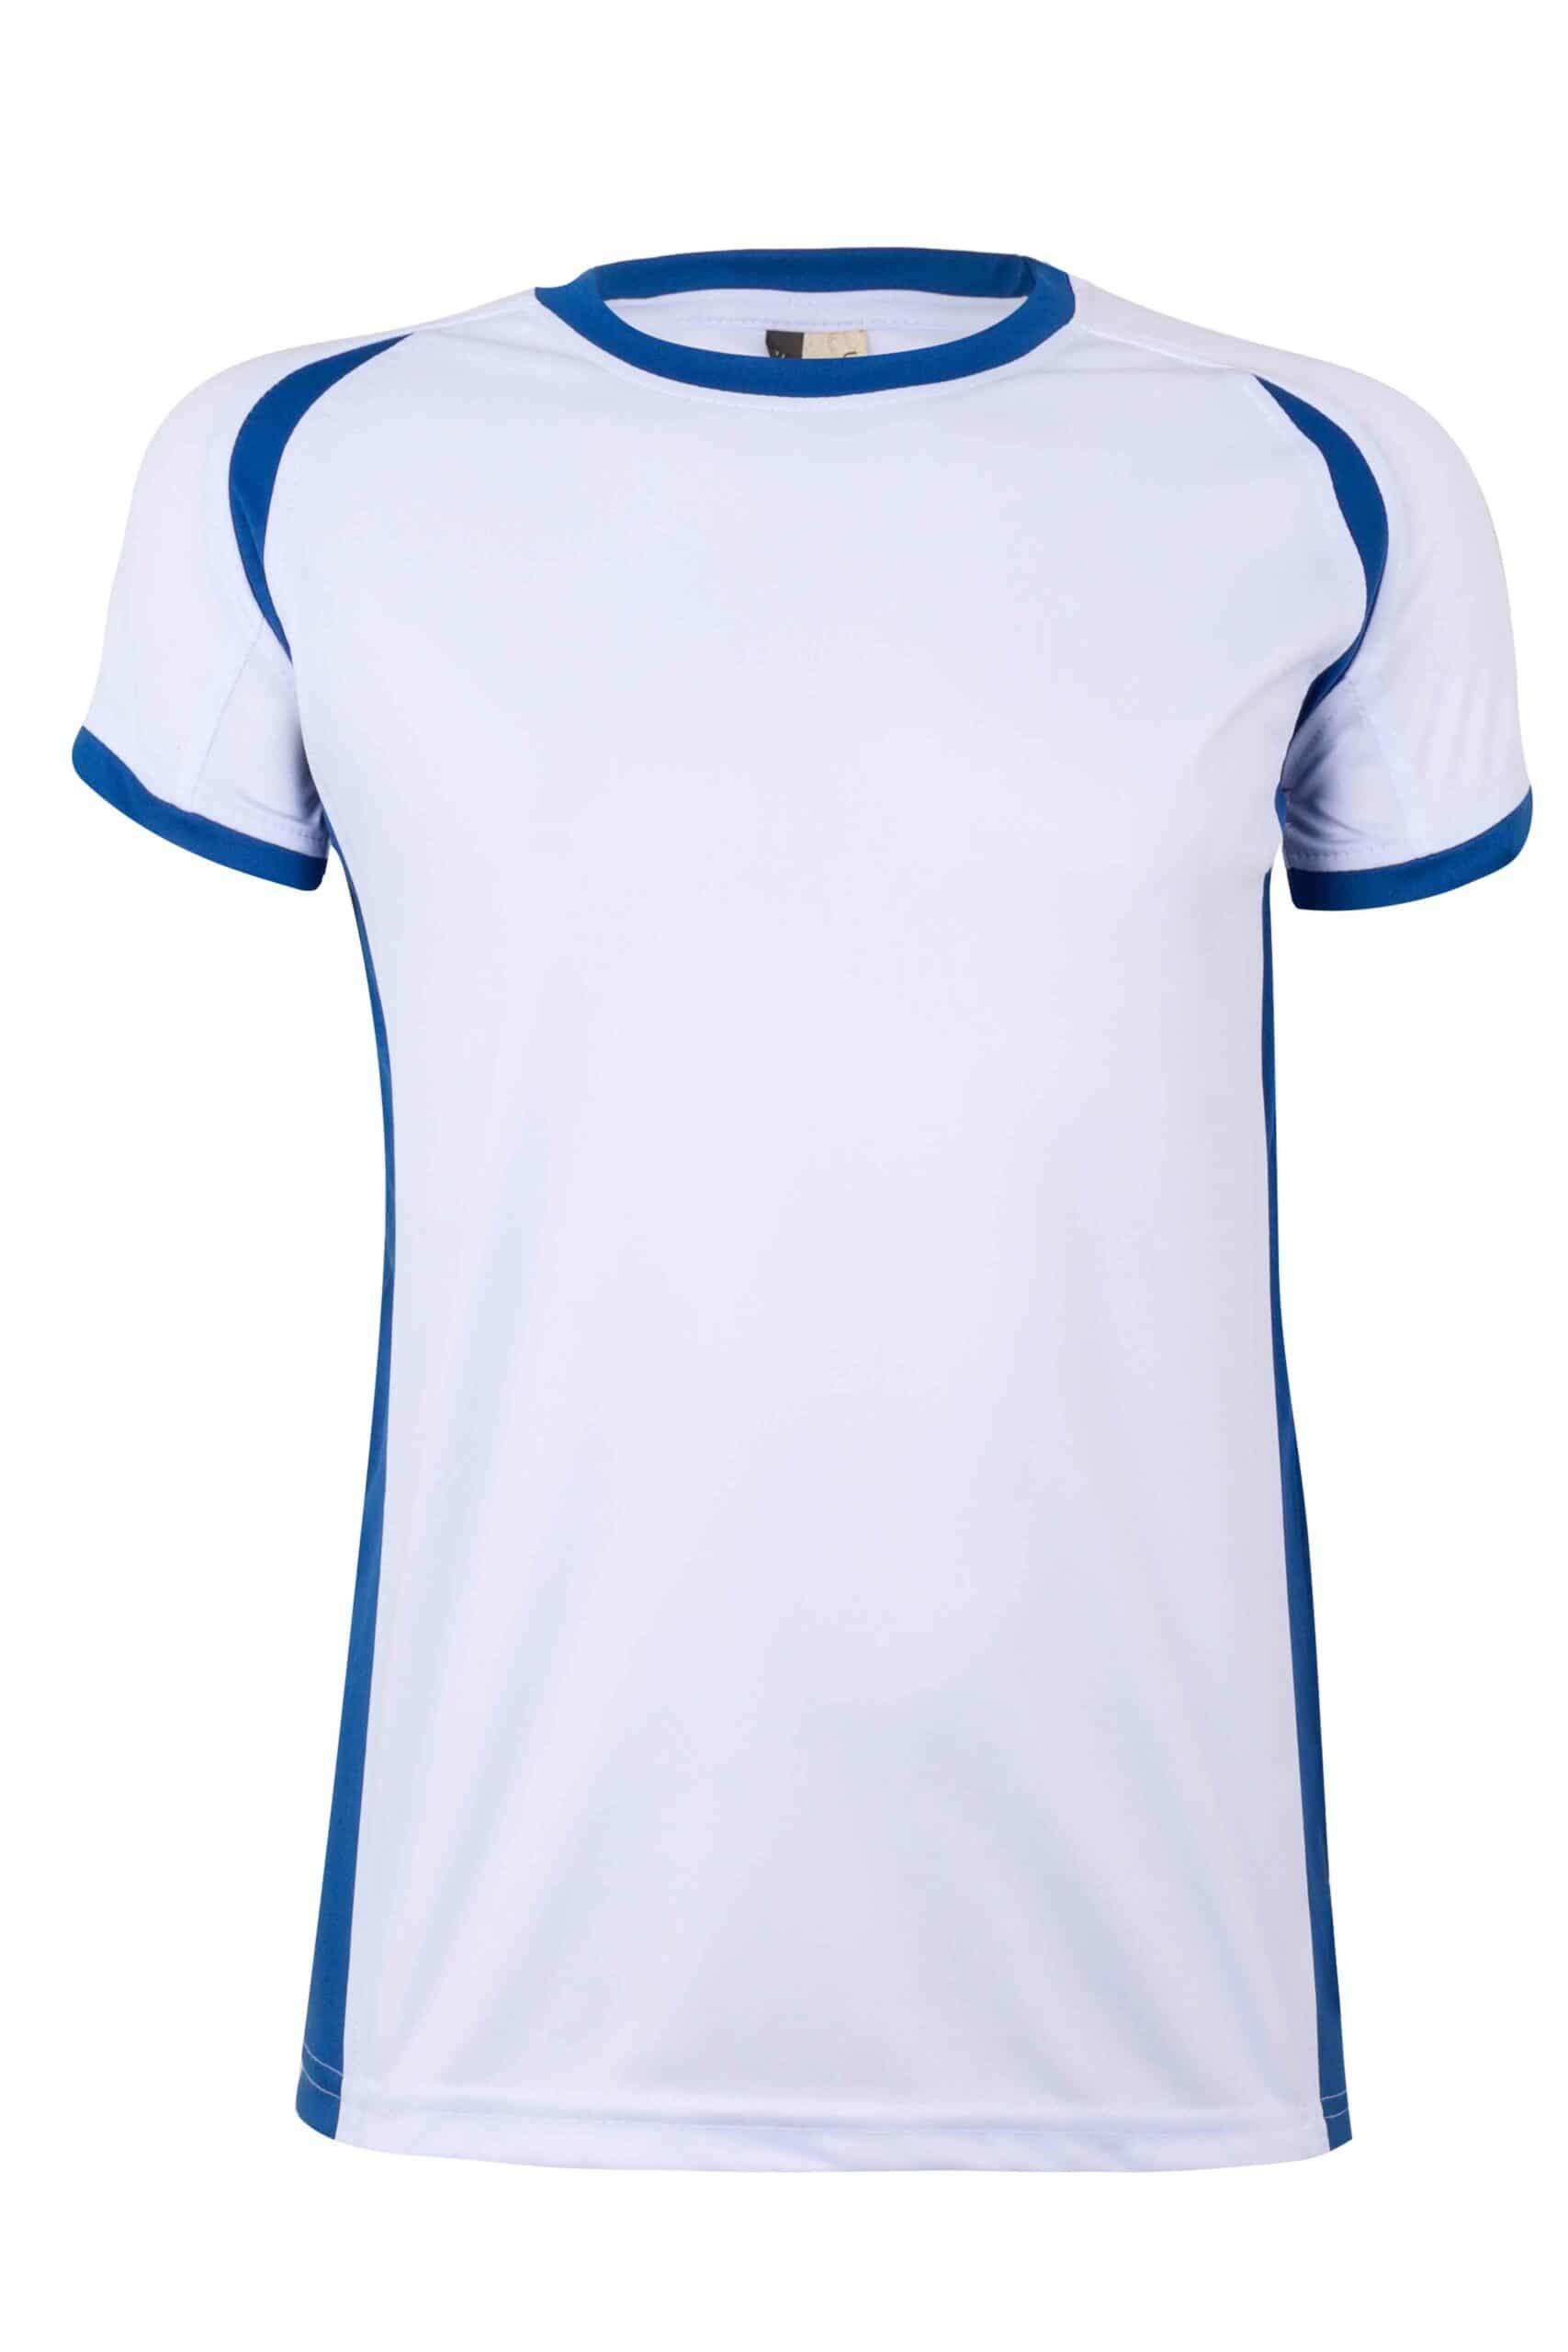 Mukua Mk531v Camiseta TÉcnica Manga Corta Bicolor NiÑo White Royal Blue 1